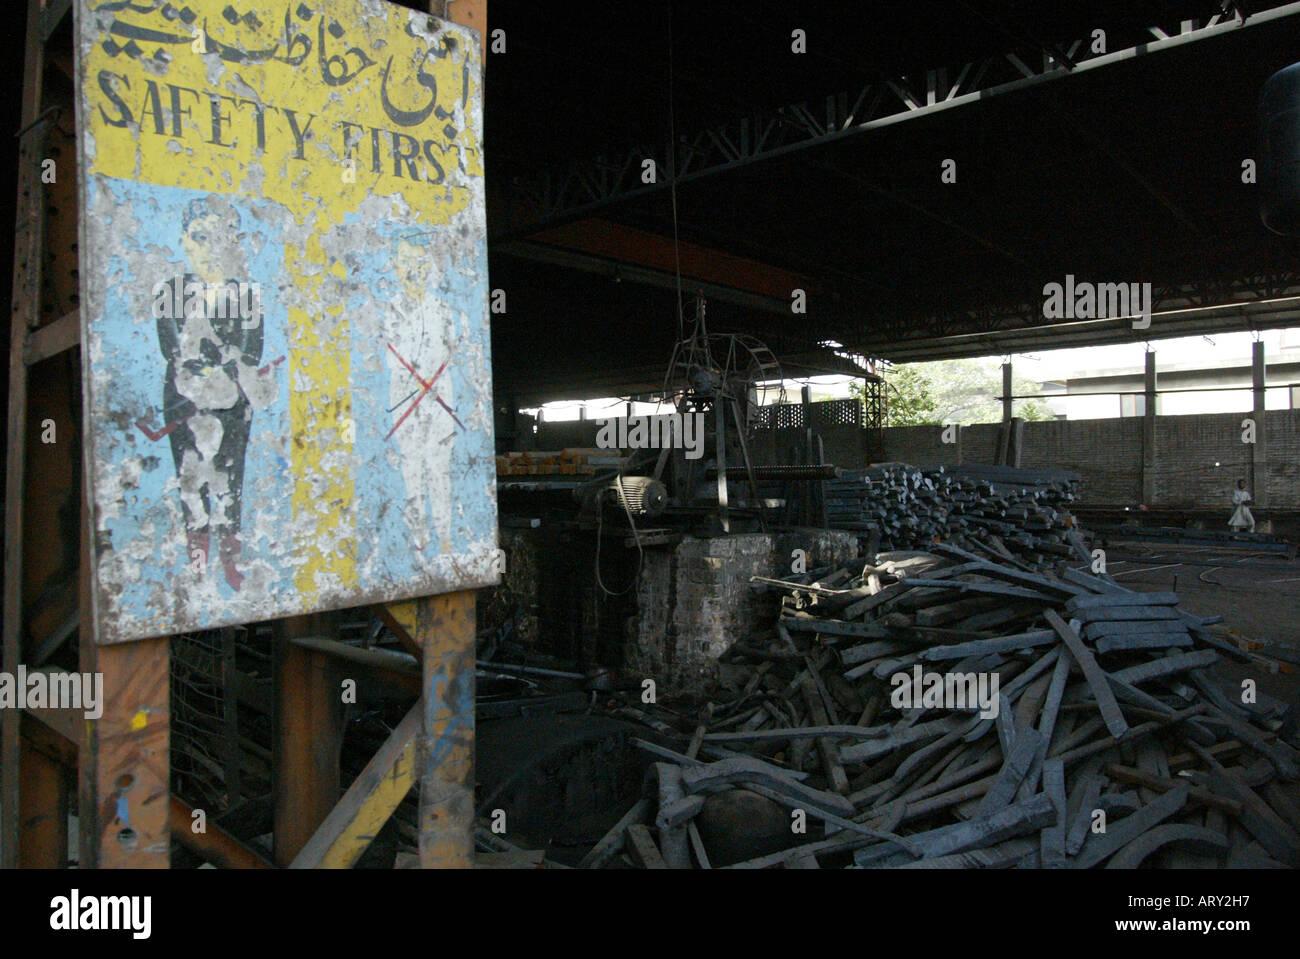 risky work in steel factories in islamabad, Pakistan Stock Photo